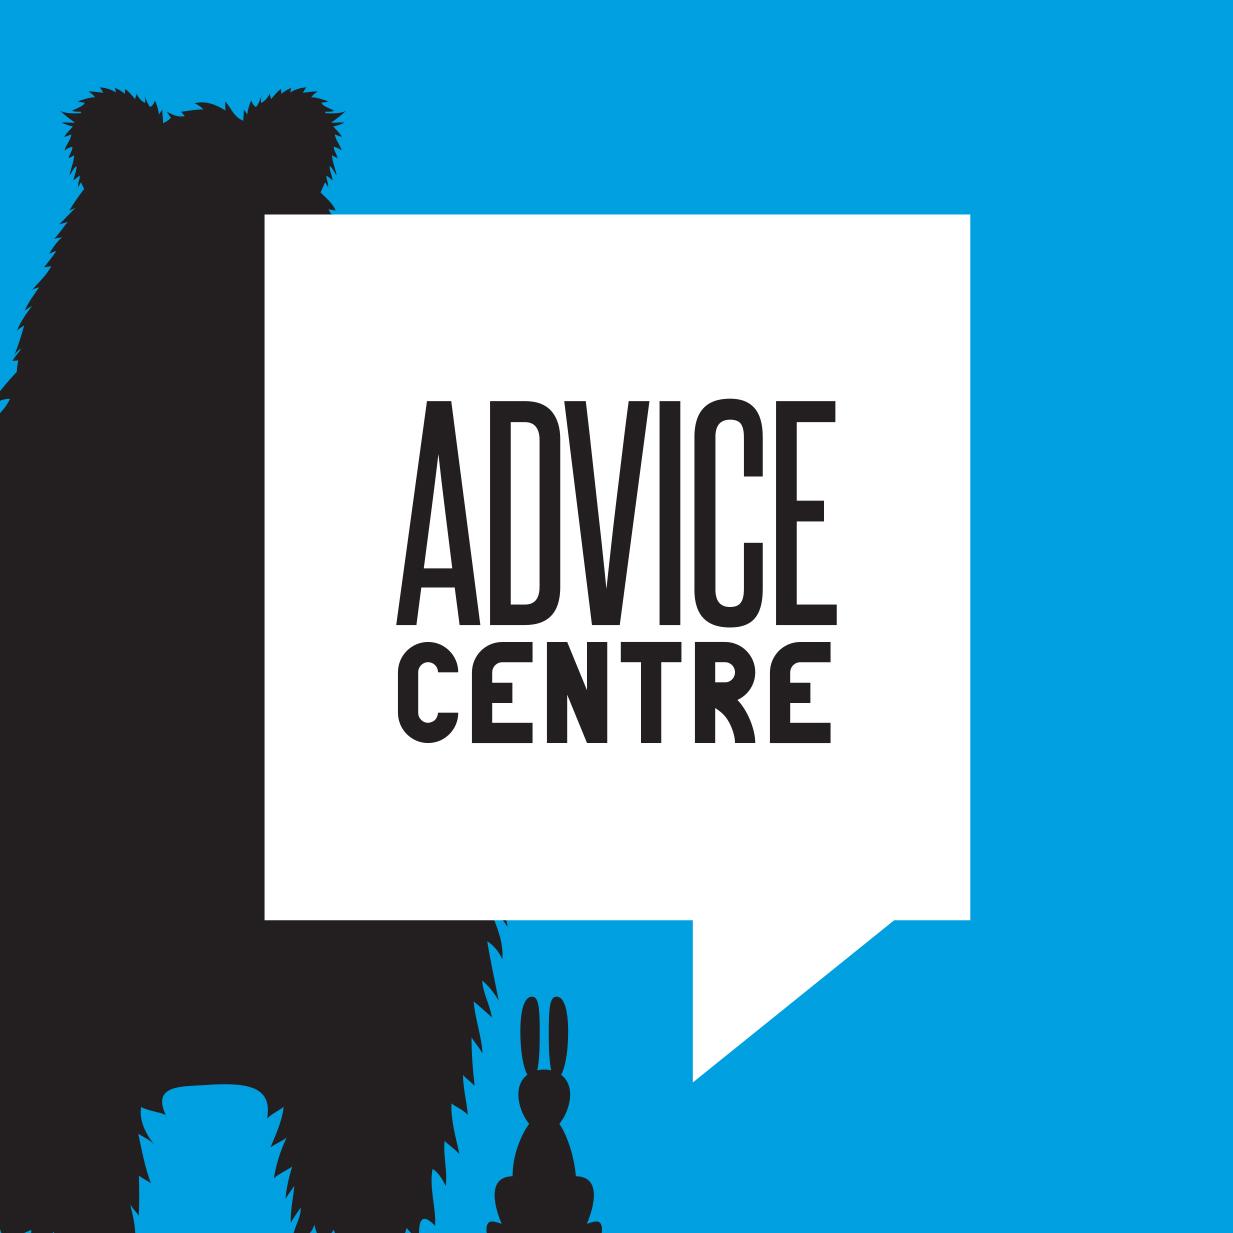 Web Button: Advice Centre